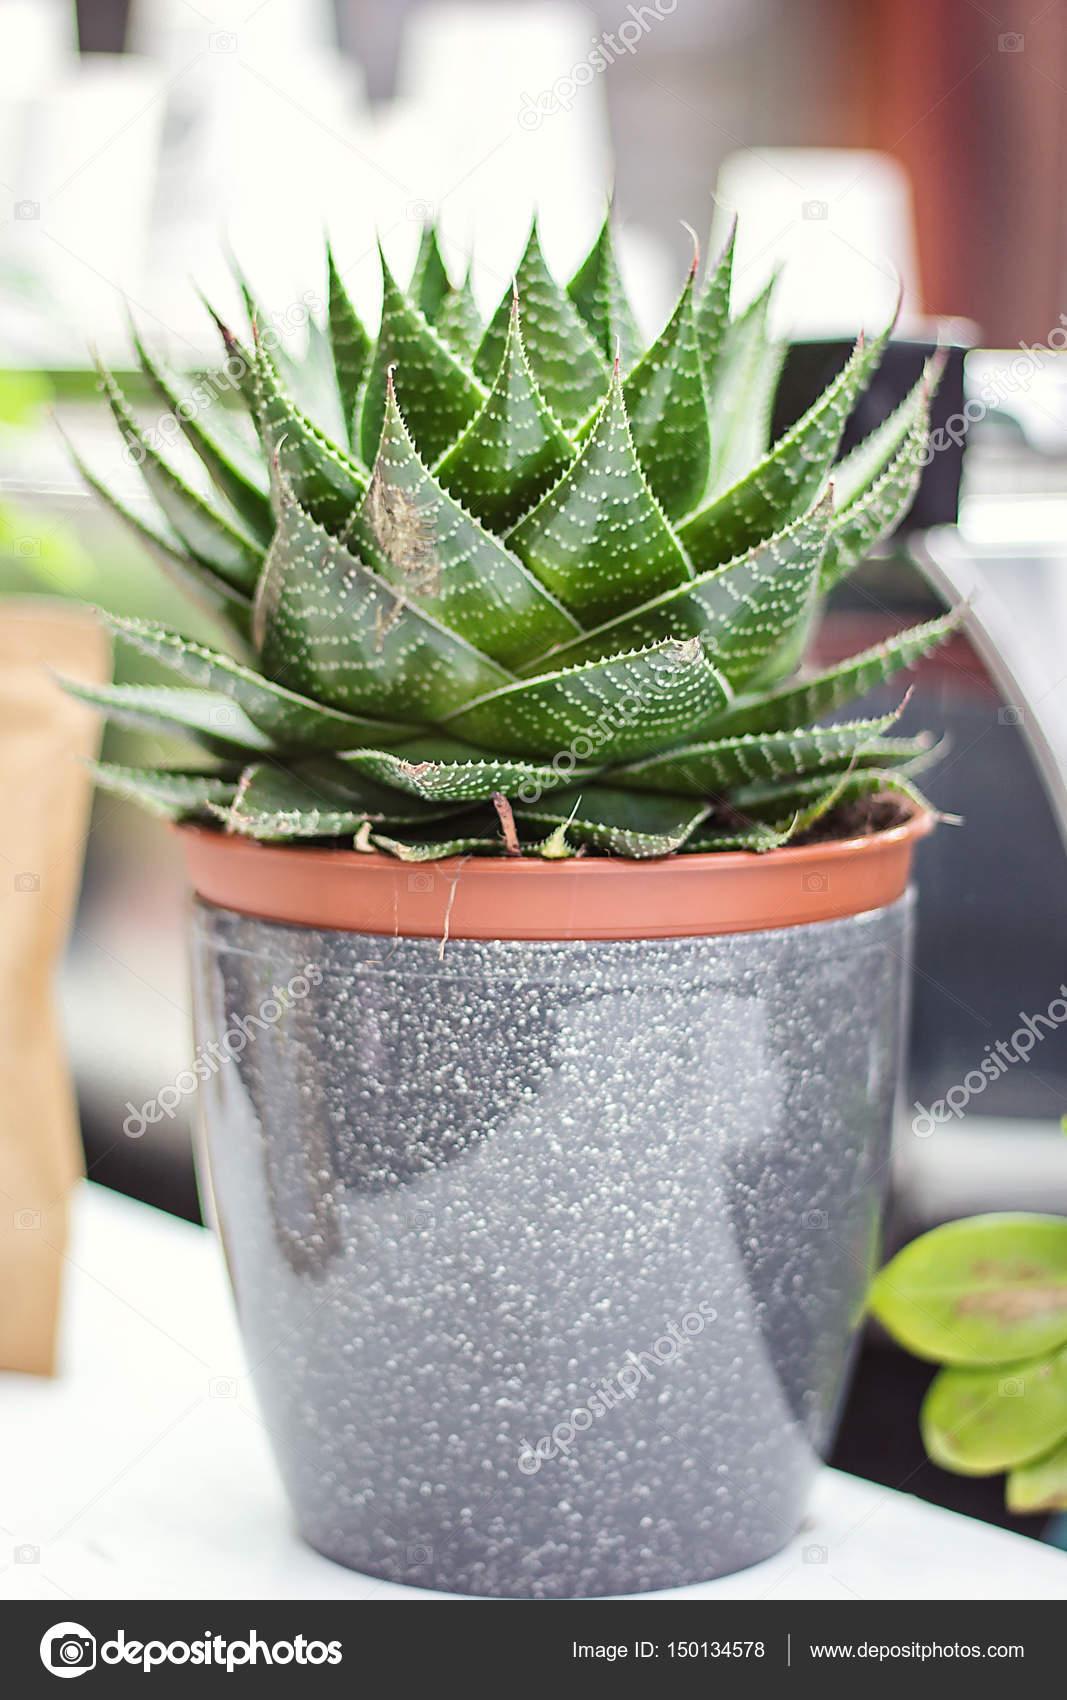 Potted Aloe Vera Plant. Aloe vera leaves tropical green medicinal ...